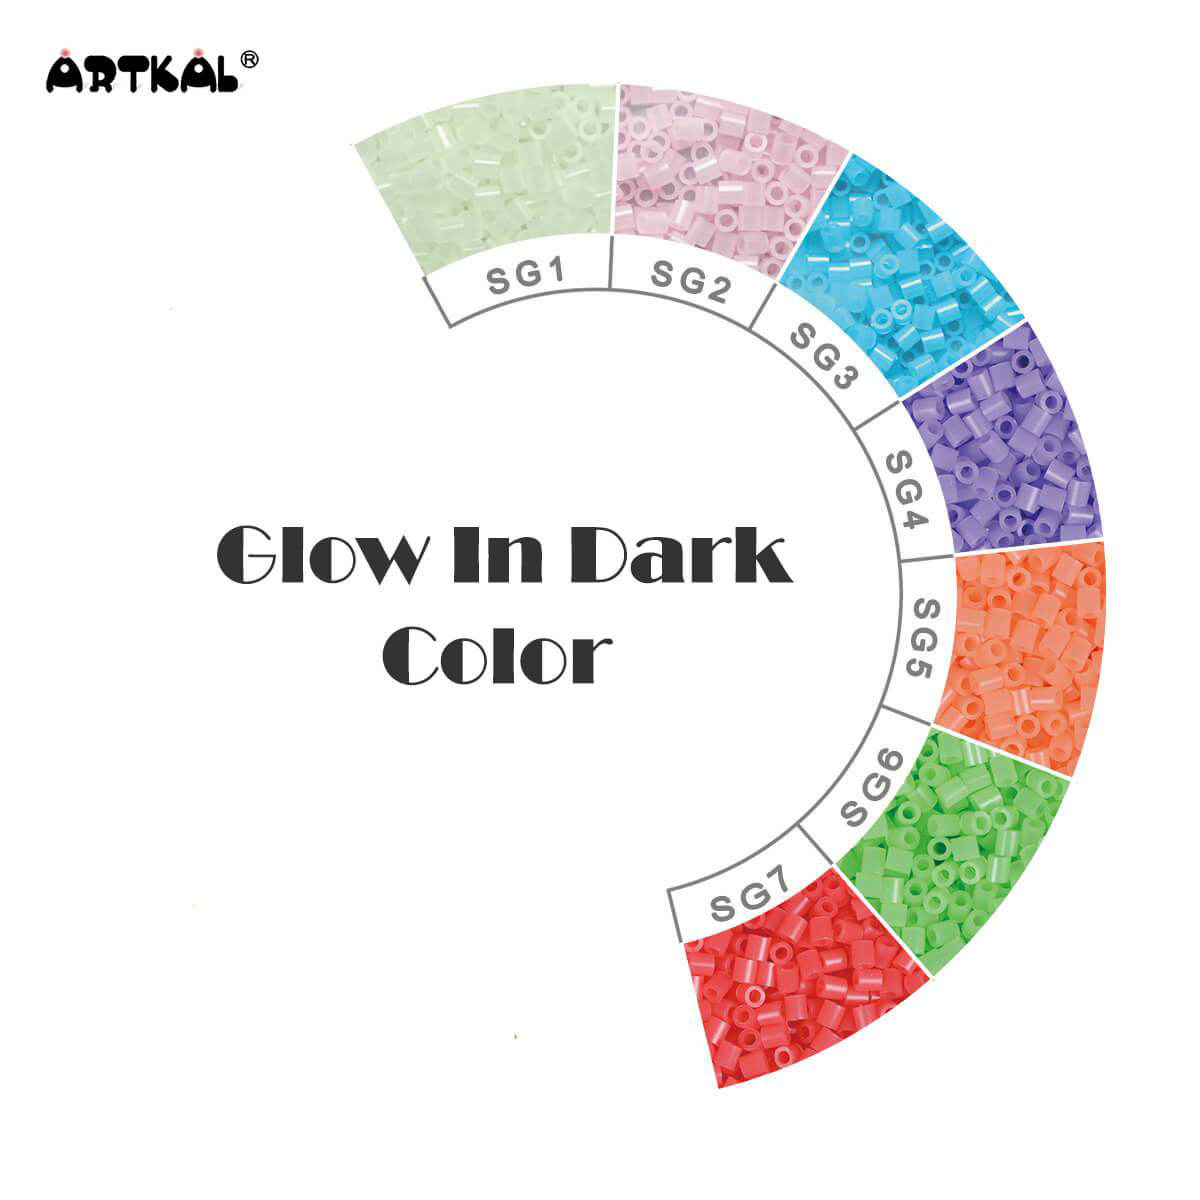 19-artkal-beads-s-5mm-sg-2000x-1-.jpg